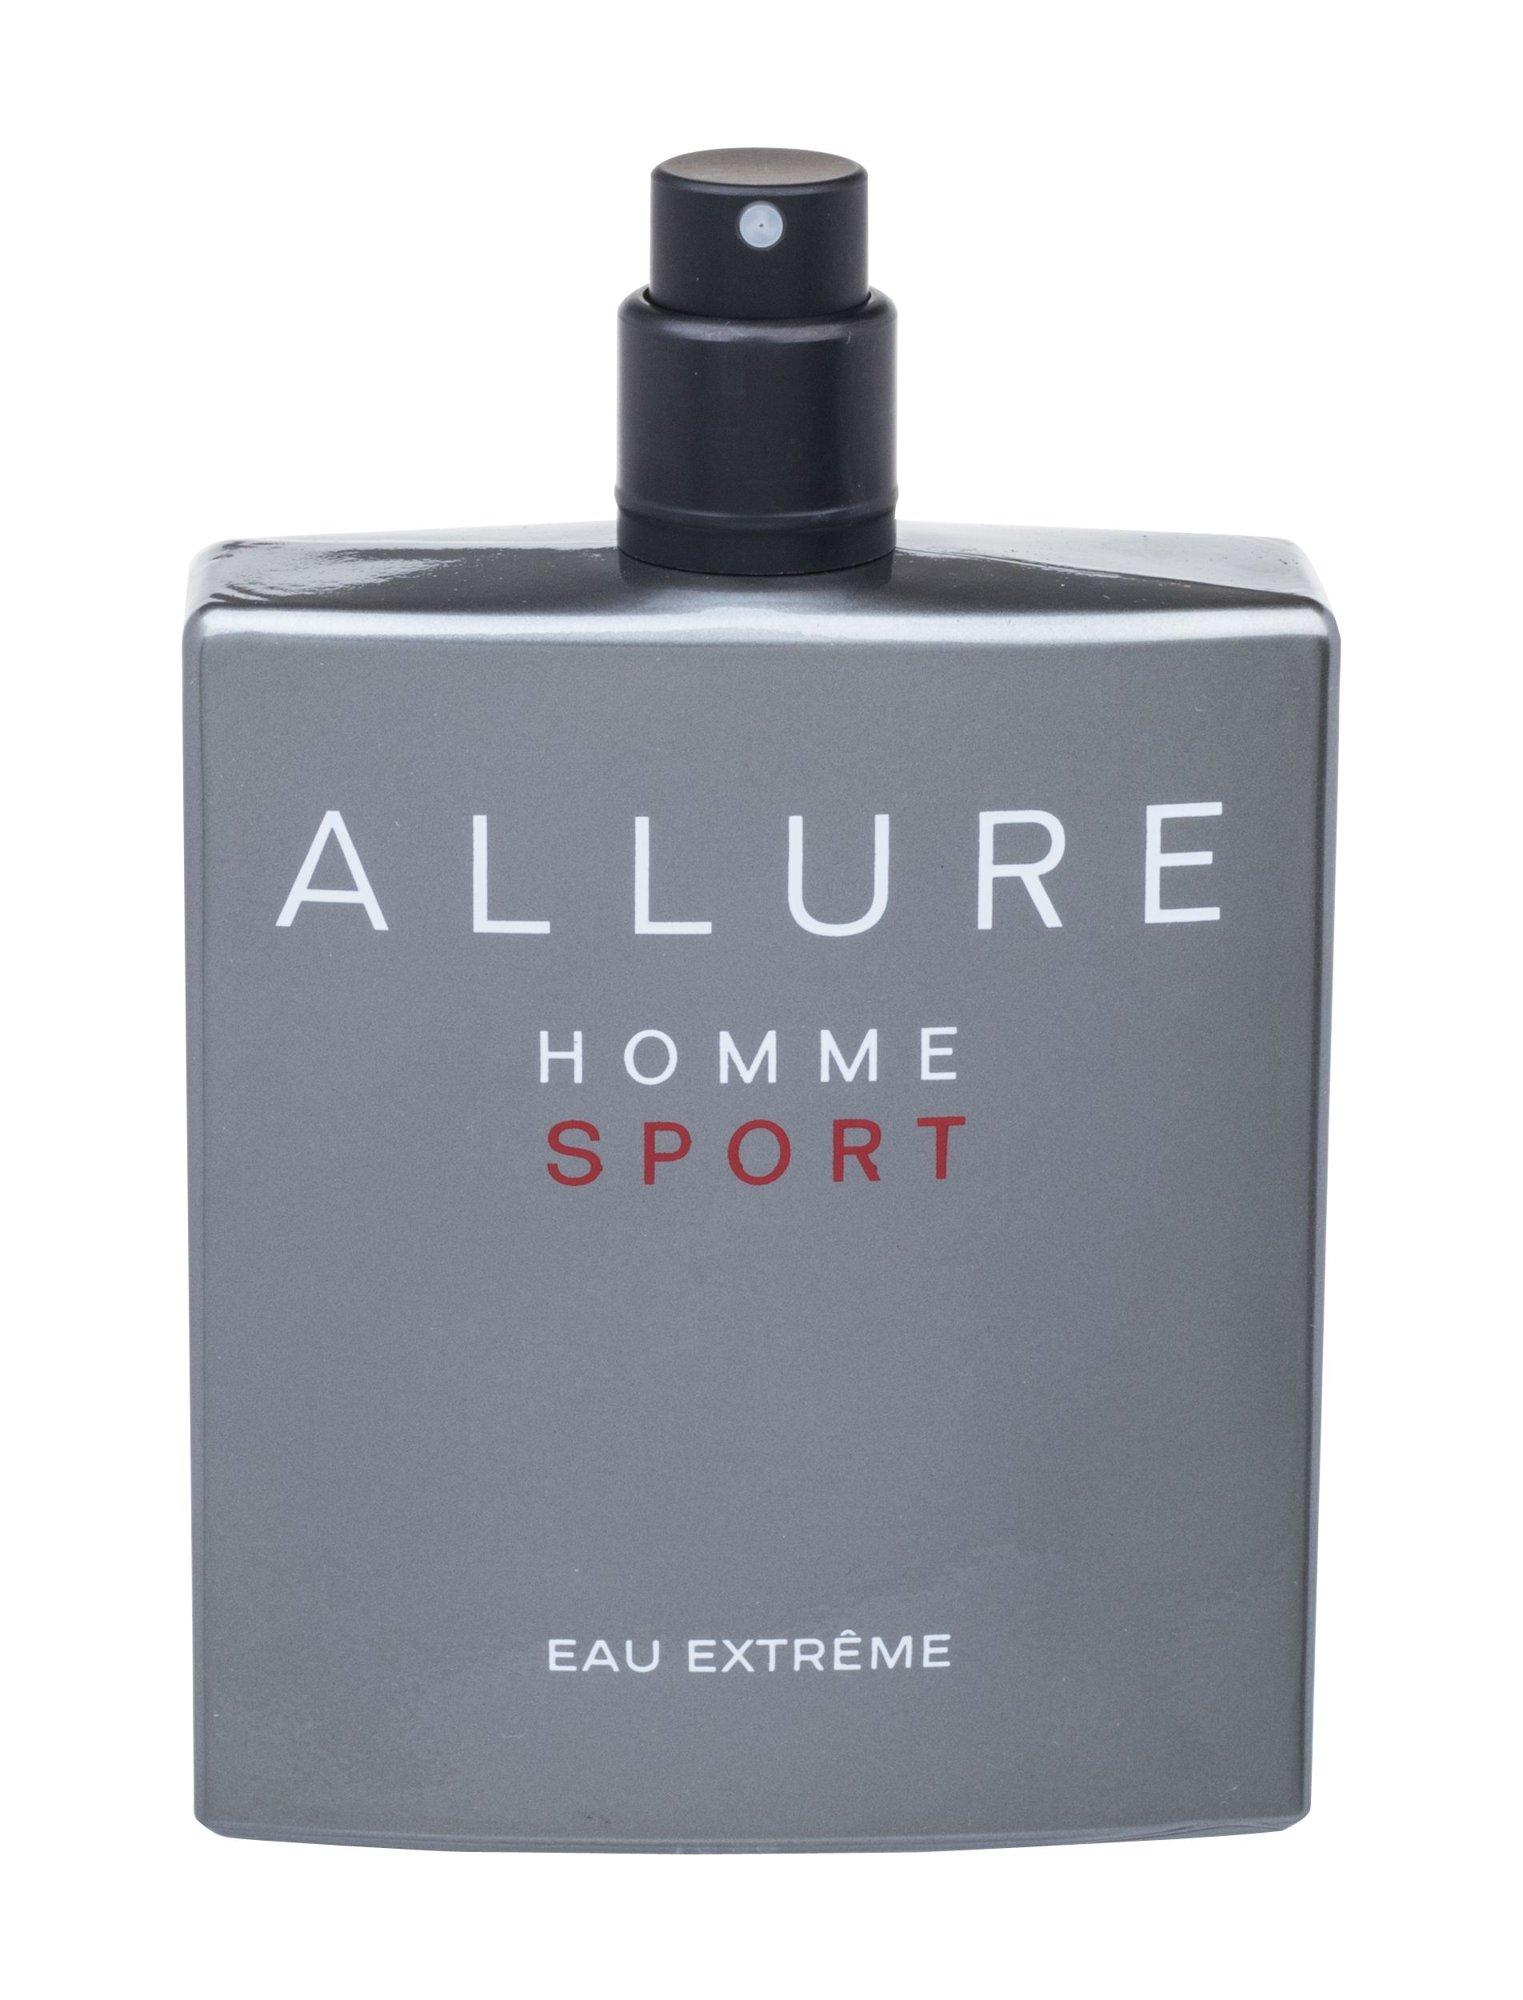 Chanel Allure Homme Sport Eau Extreme EDP 100ml